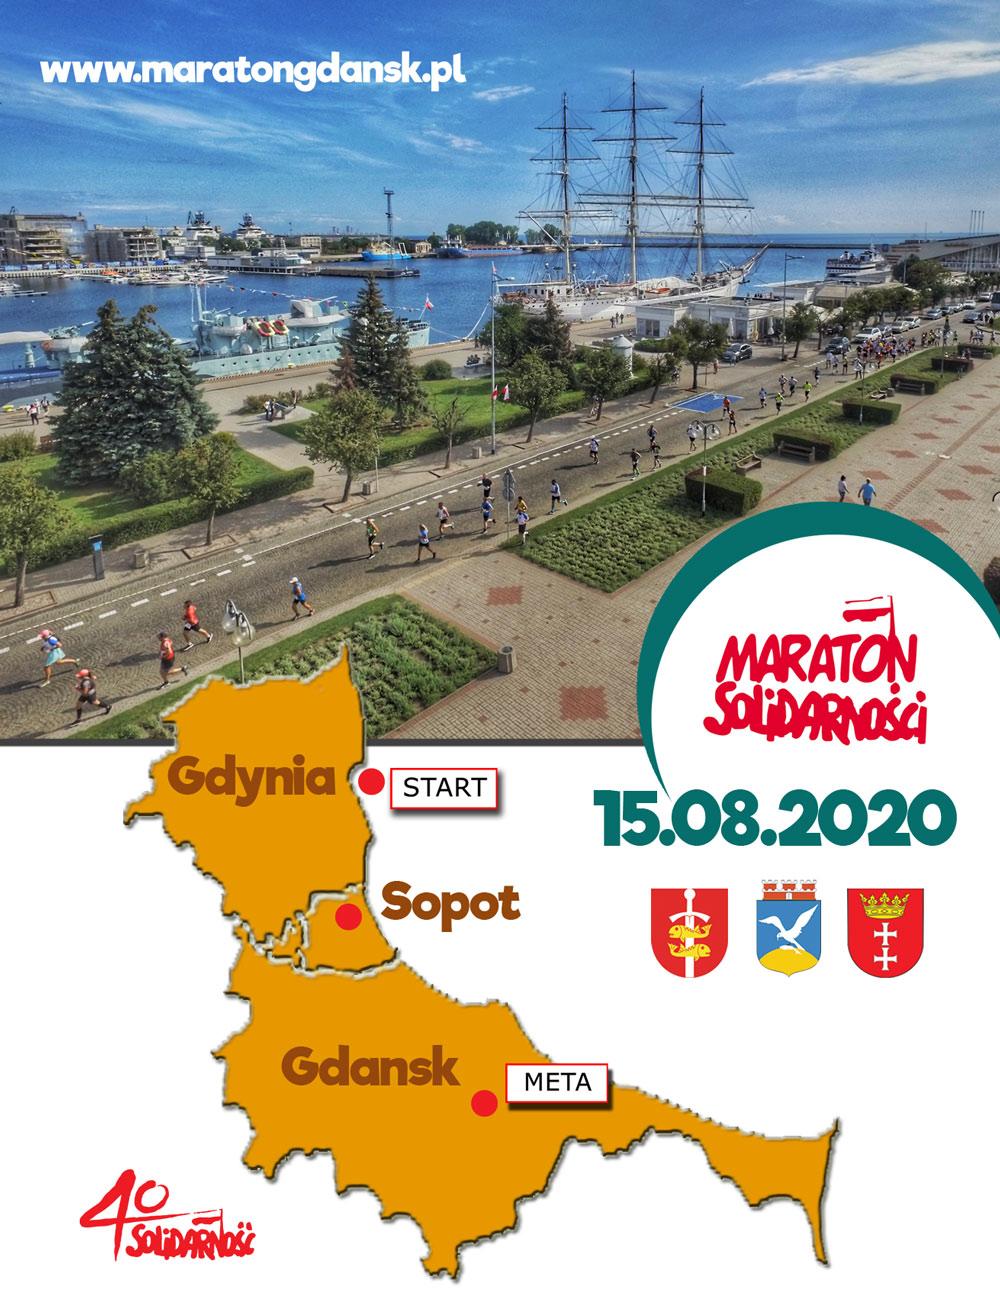 ulotka 26 maraton solidarnosci logo maratonu